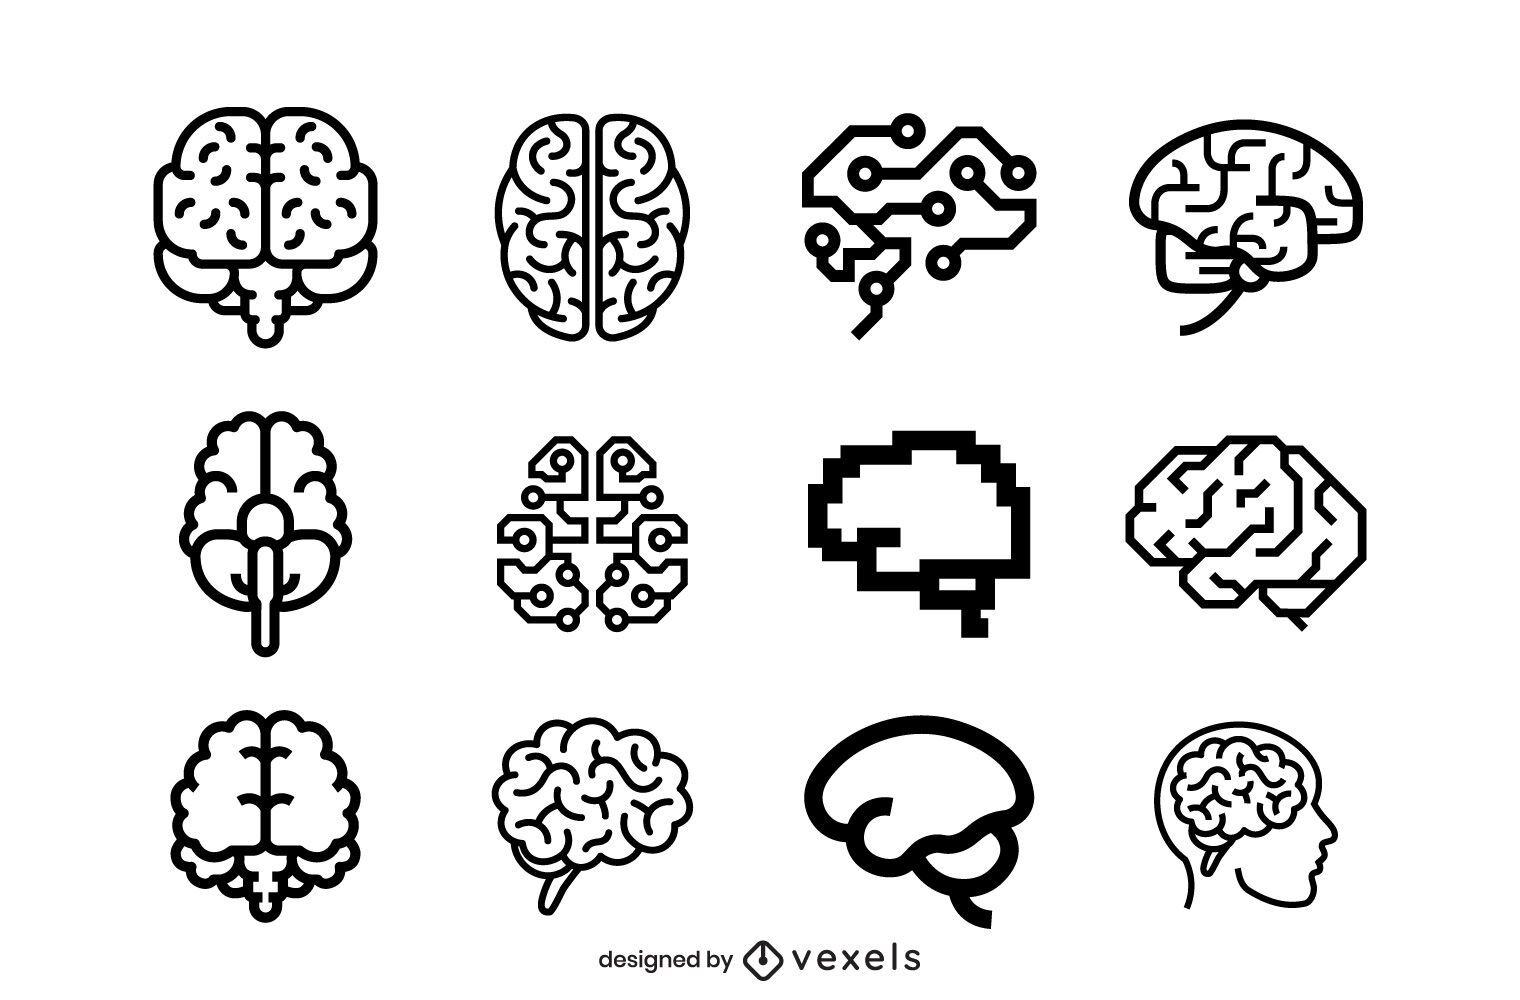 Brain icons stroke set